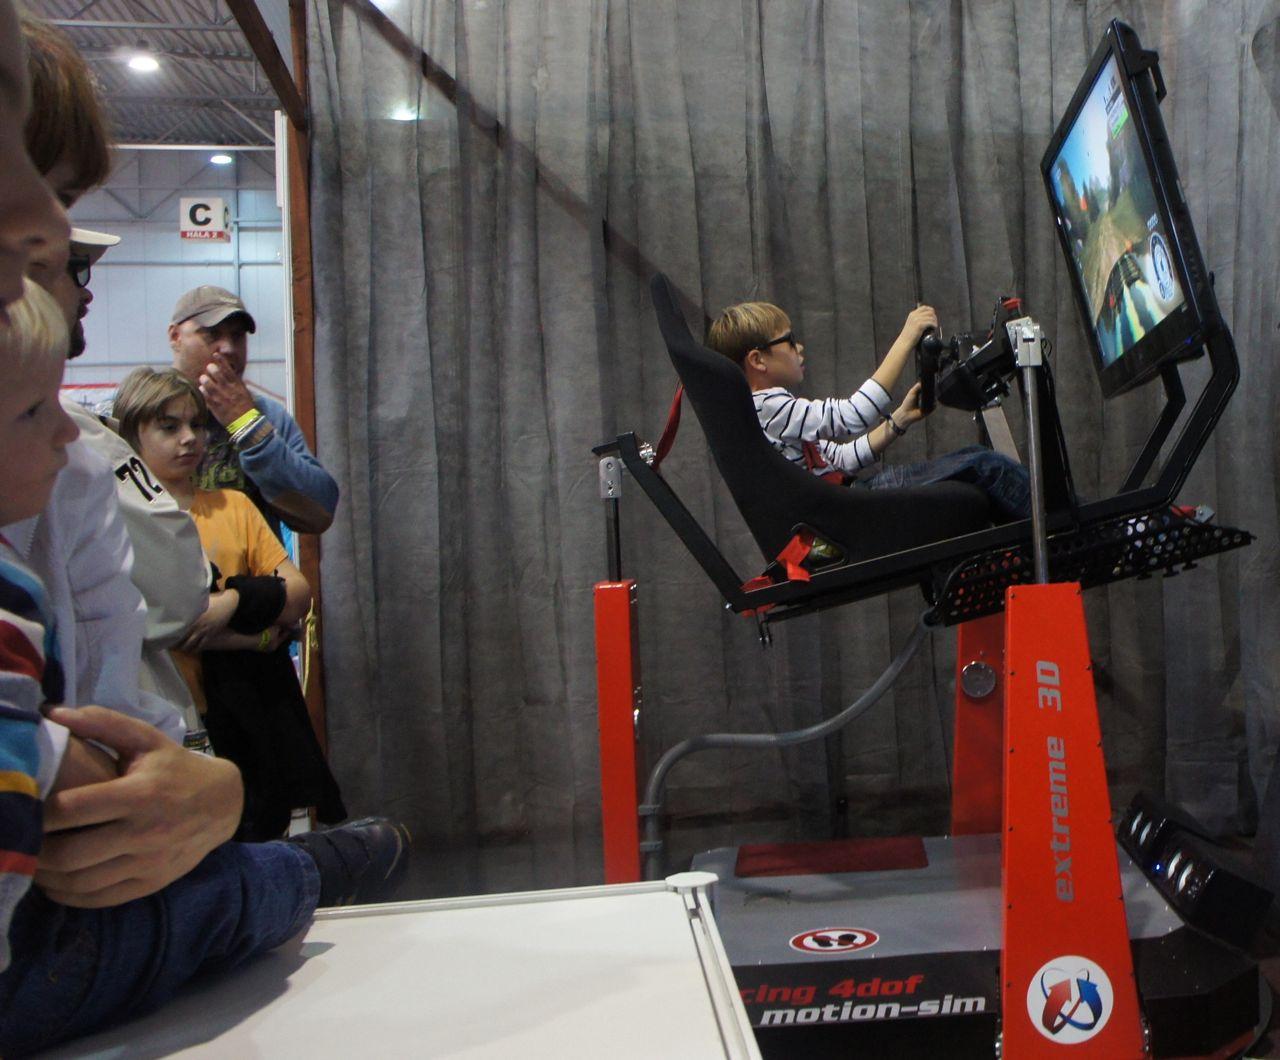 crazy-racing-simulator-by-motion-sim_2.jpg